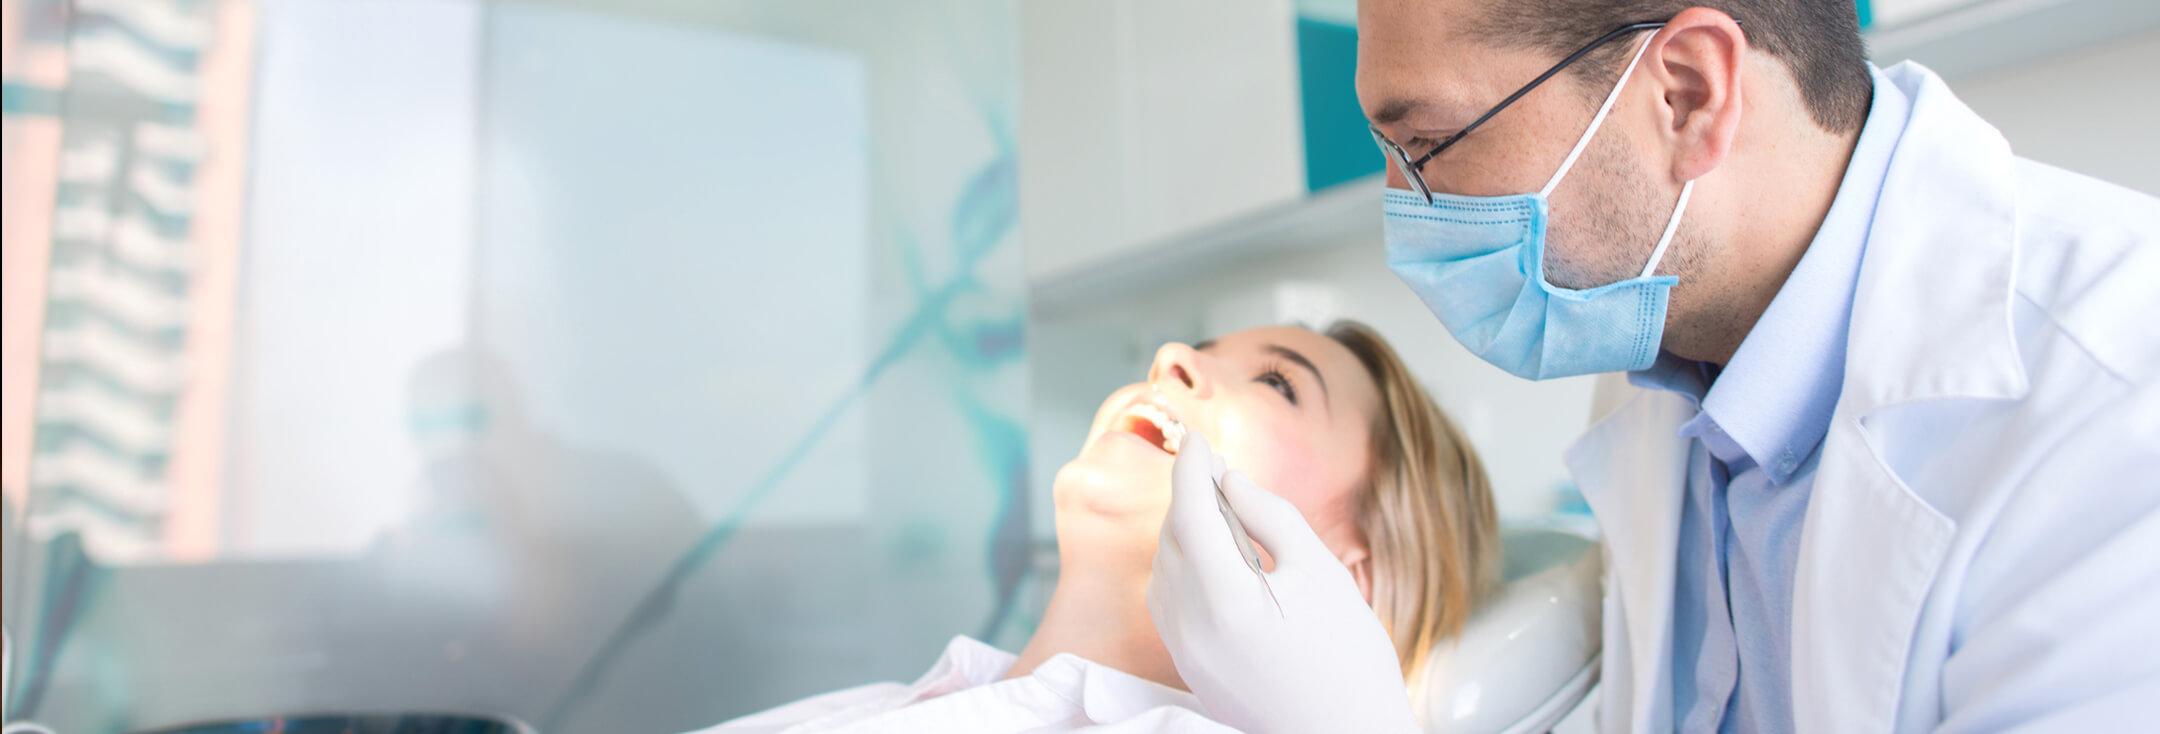 Les soins dentaires